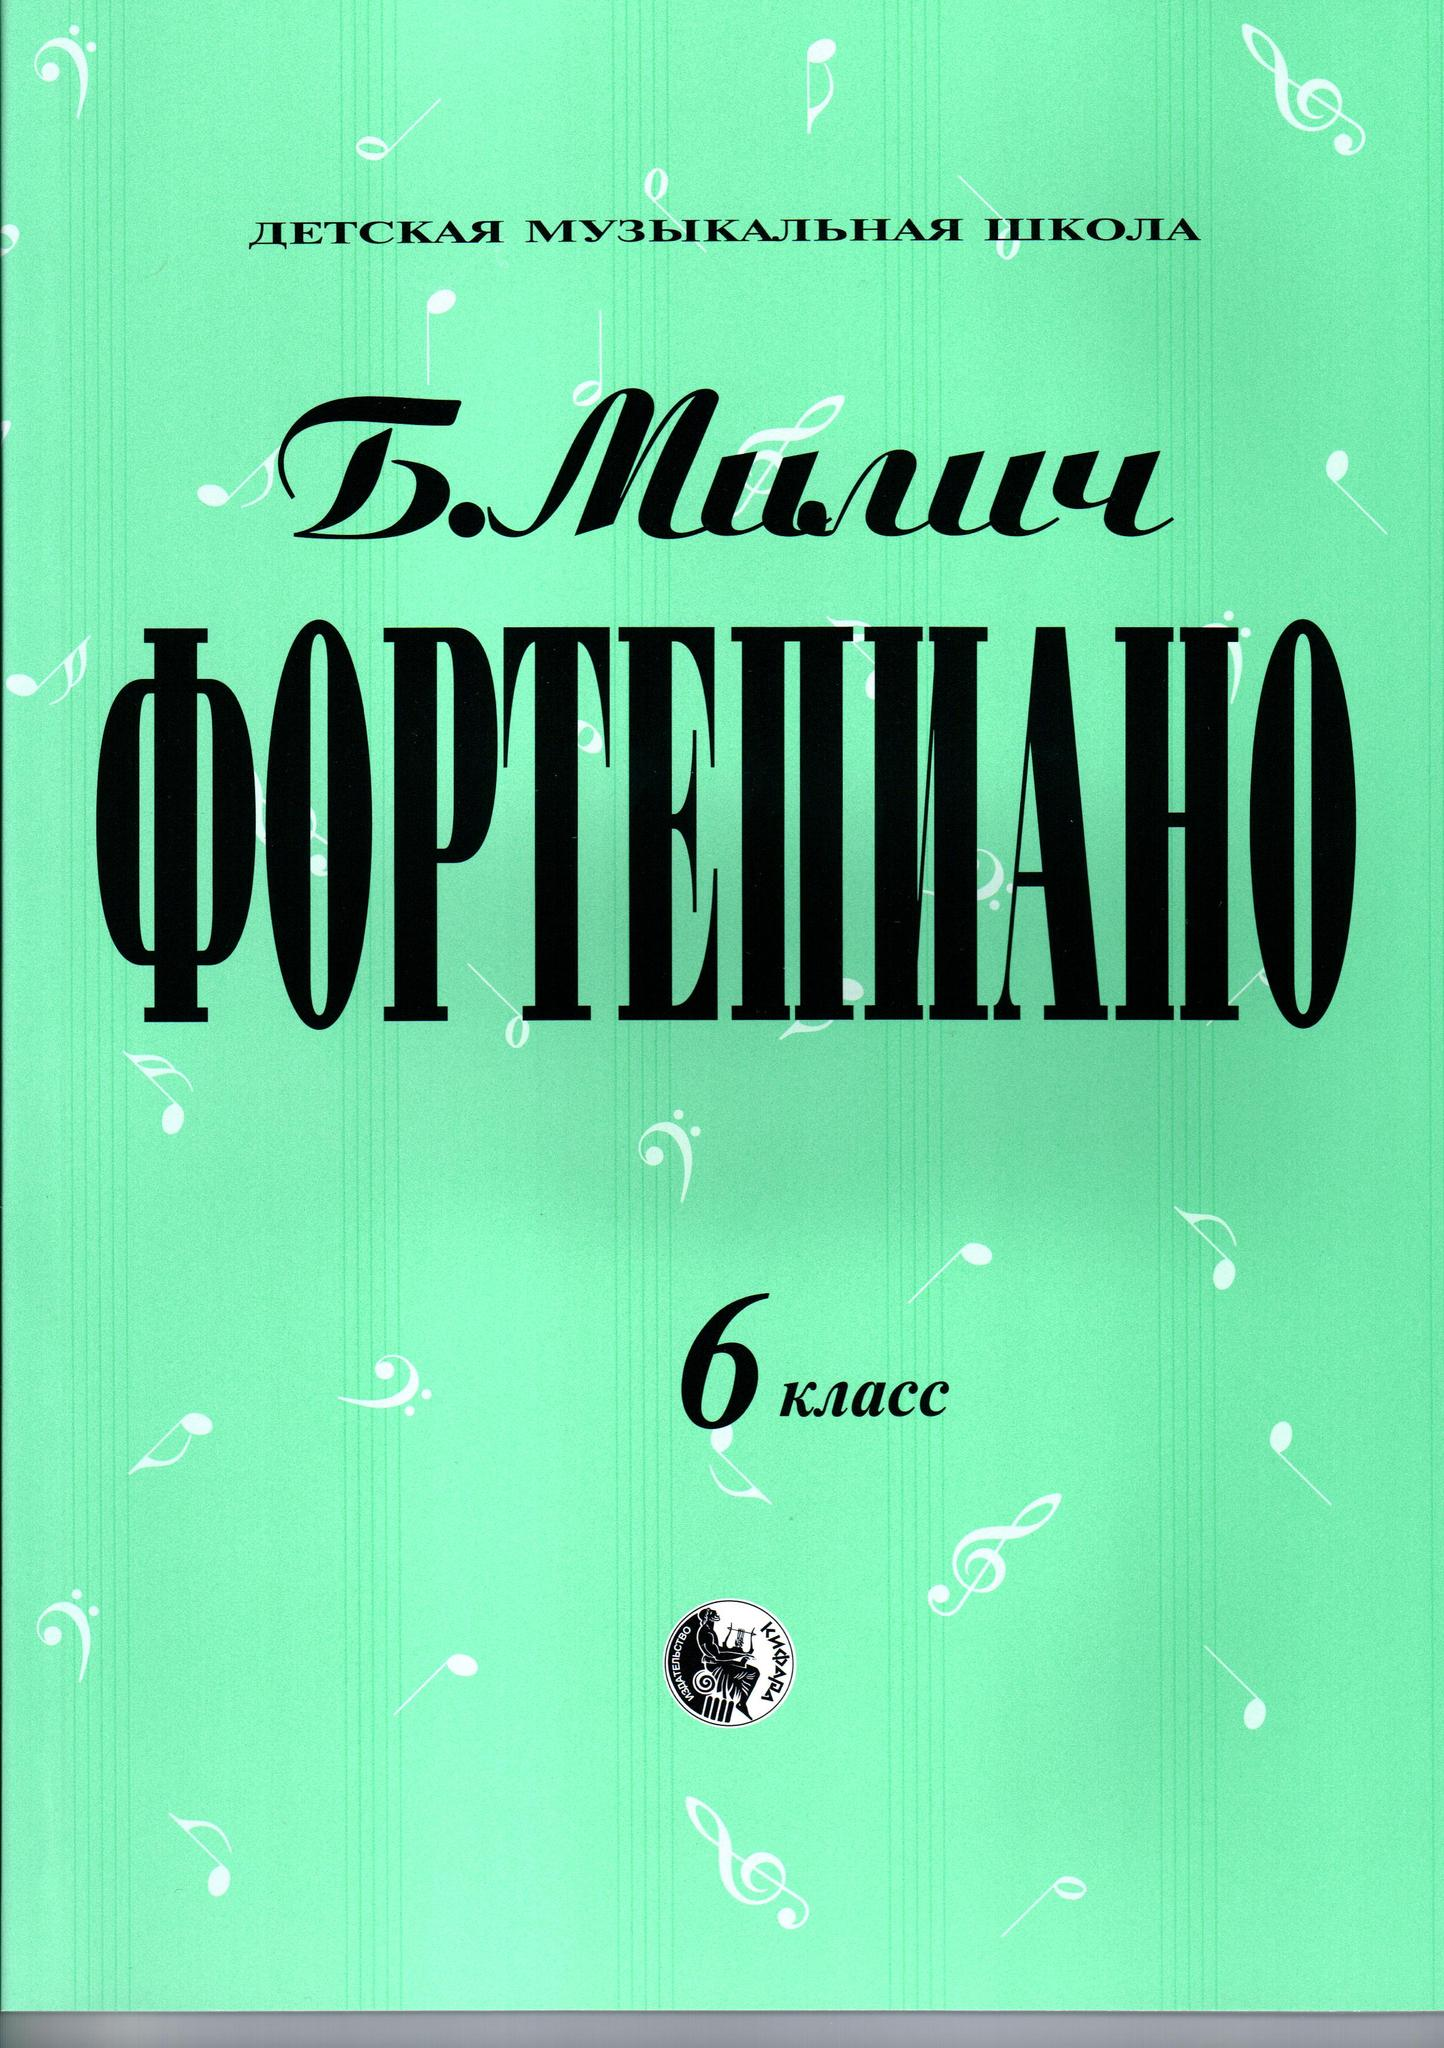 Милич Б. Фортепиано. 6 класс ДМШ